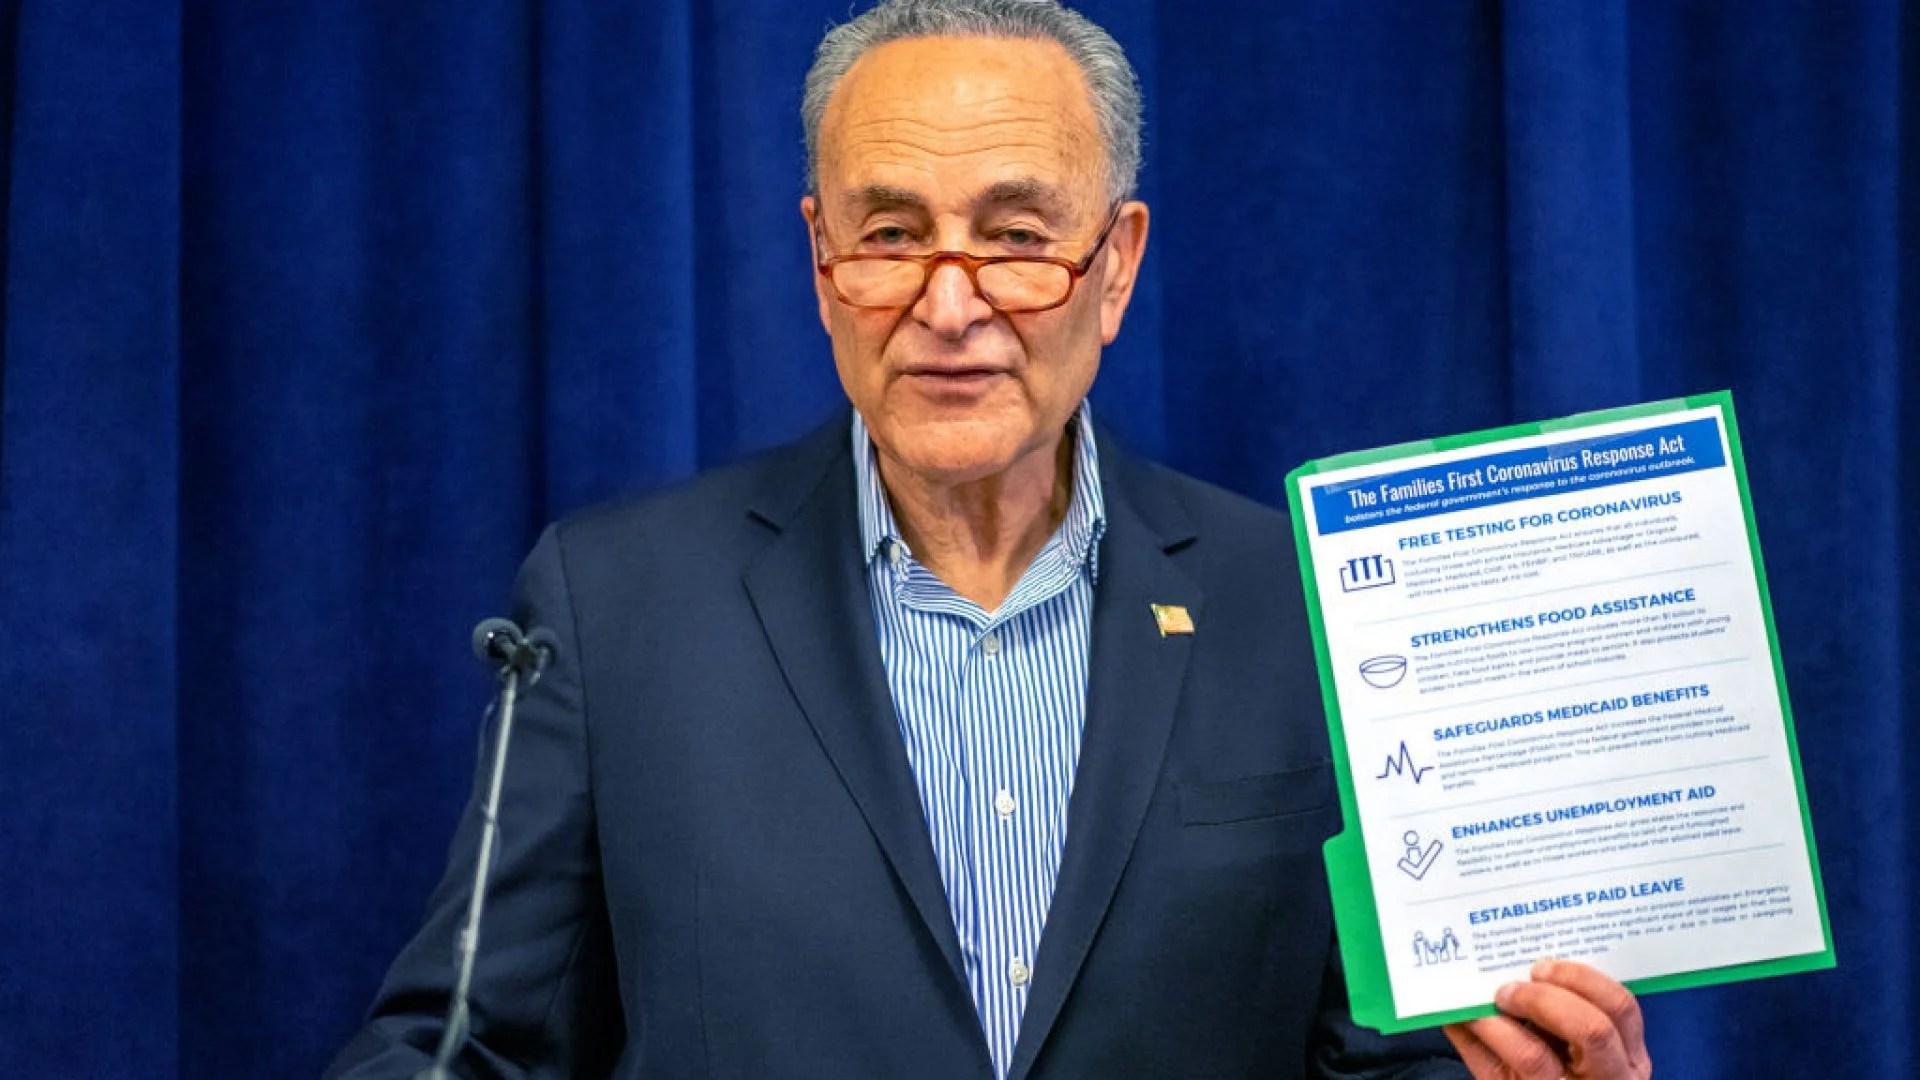 COVID-19 Pandemic: Senate Passes Emergency Aid Relief Bill